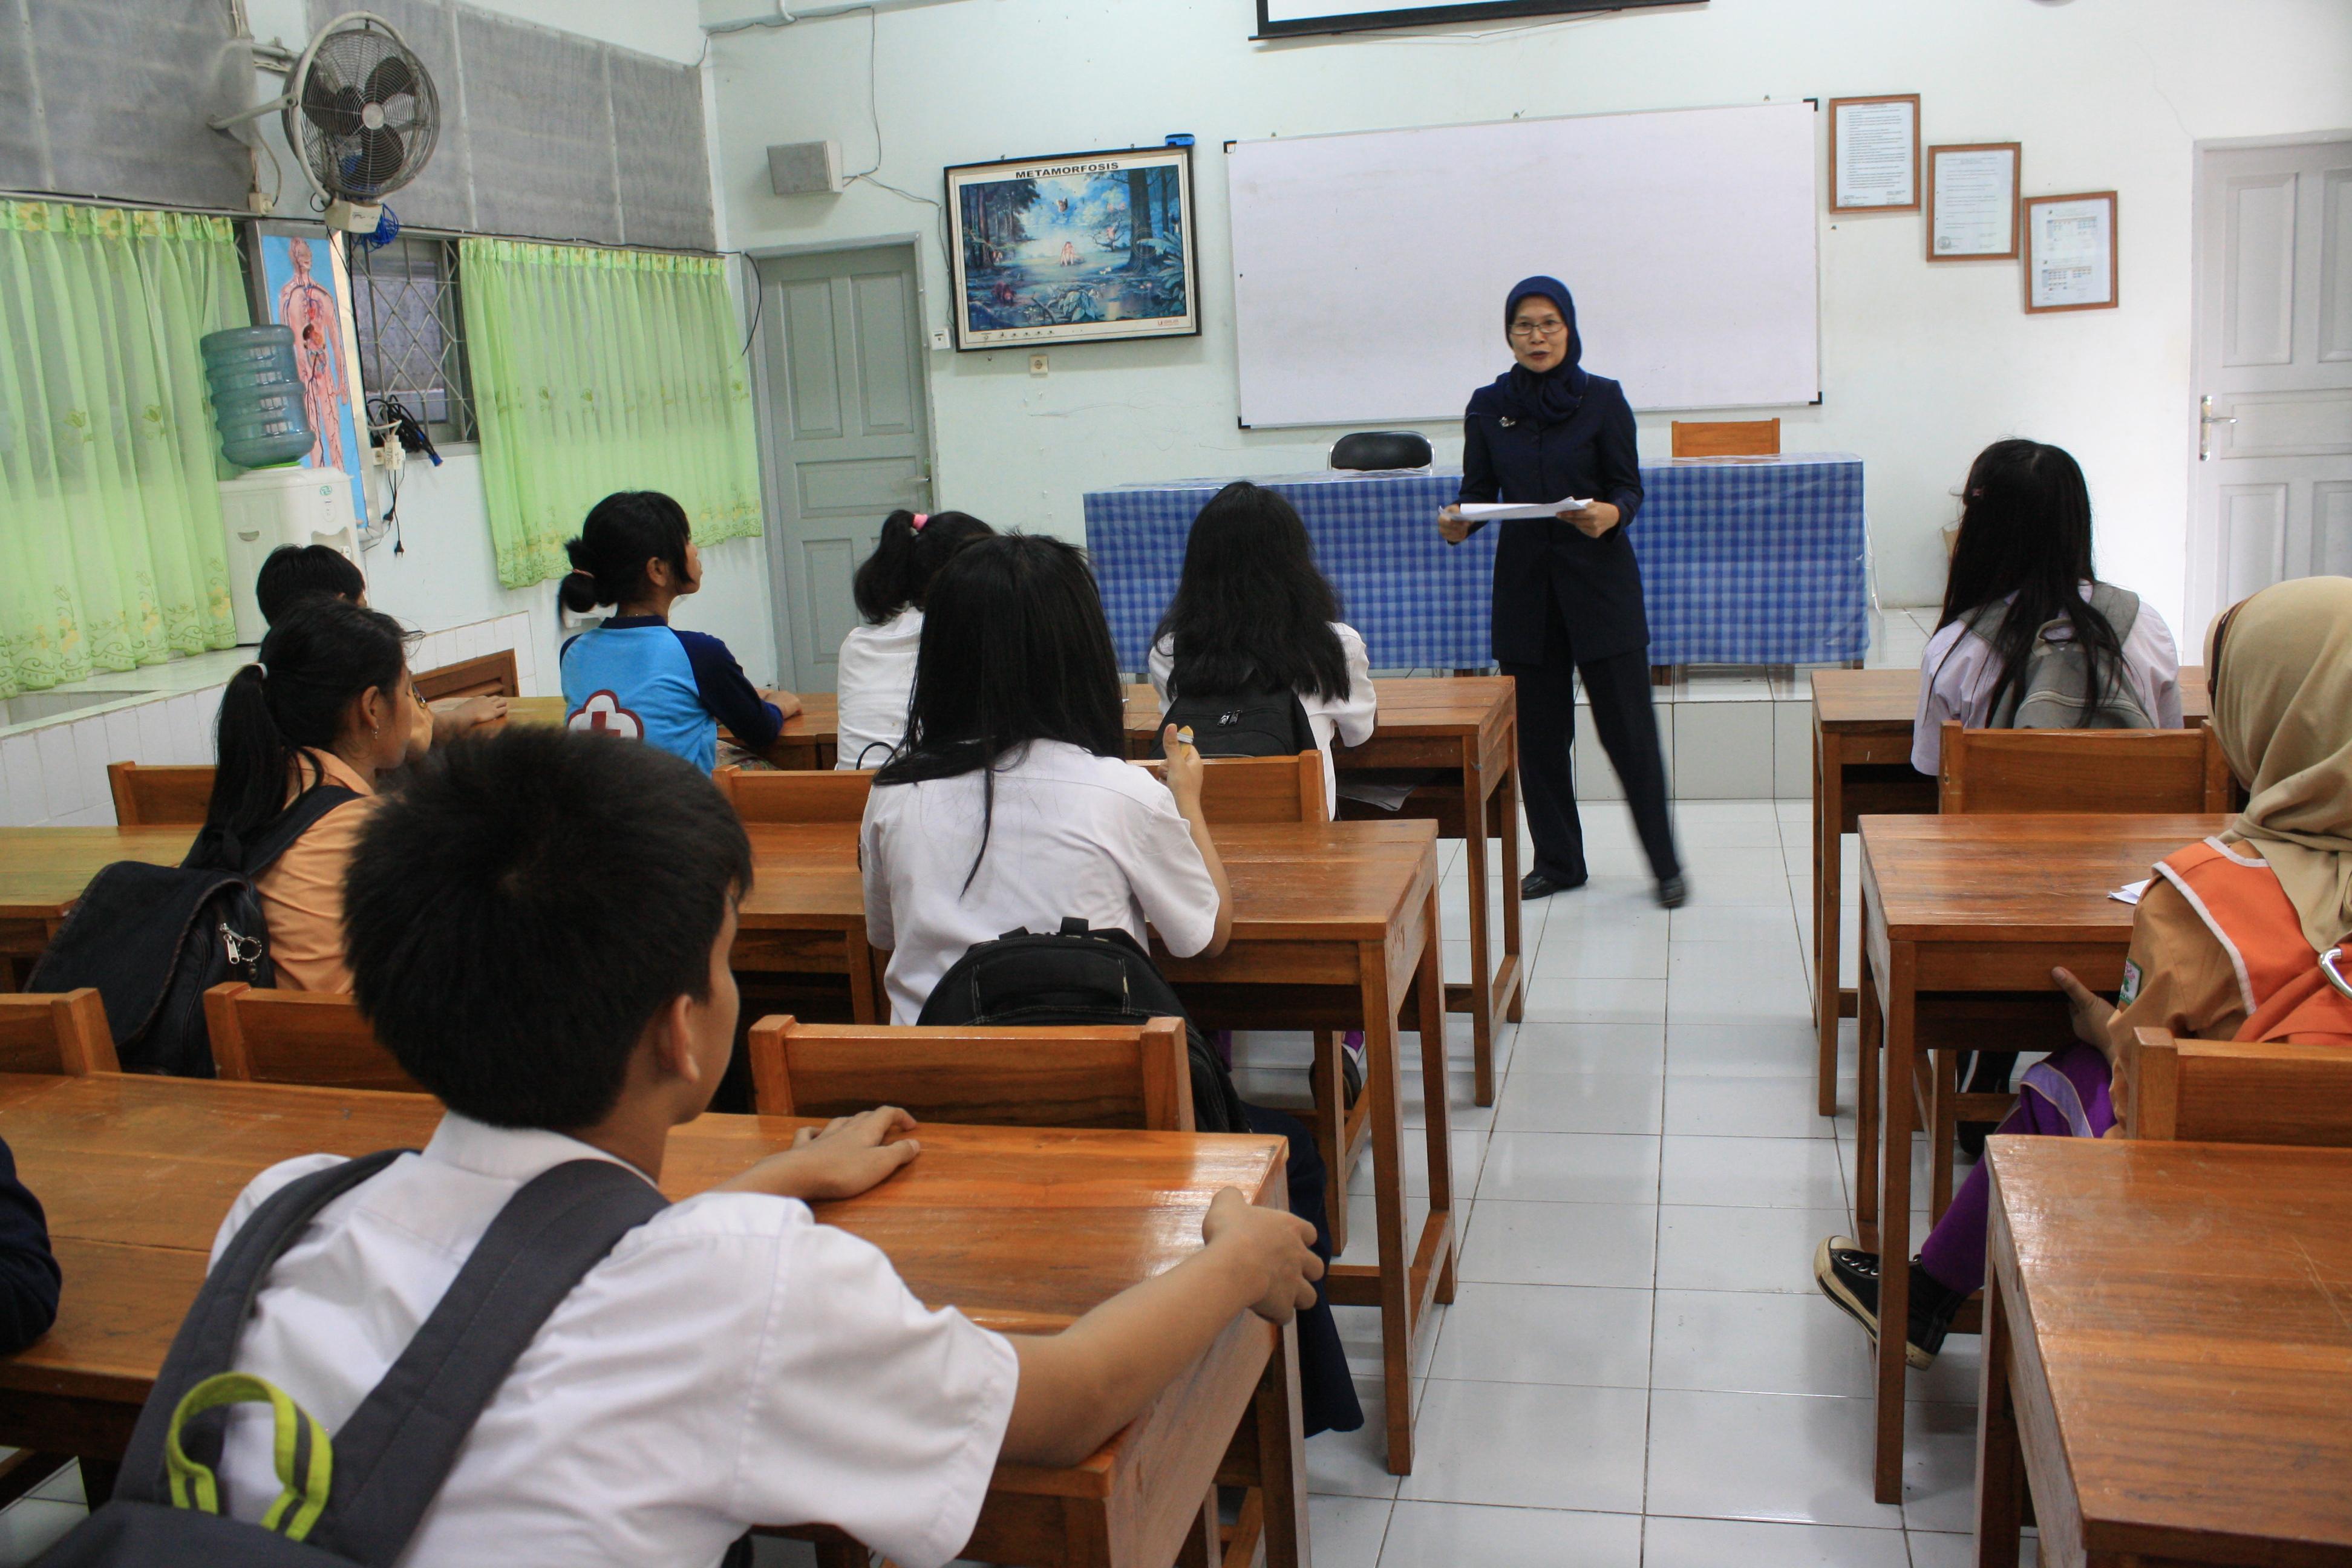 Serba serbi dunia pendidikan - Ettylist's Blog